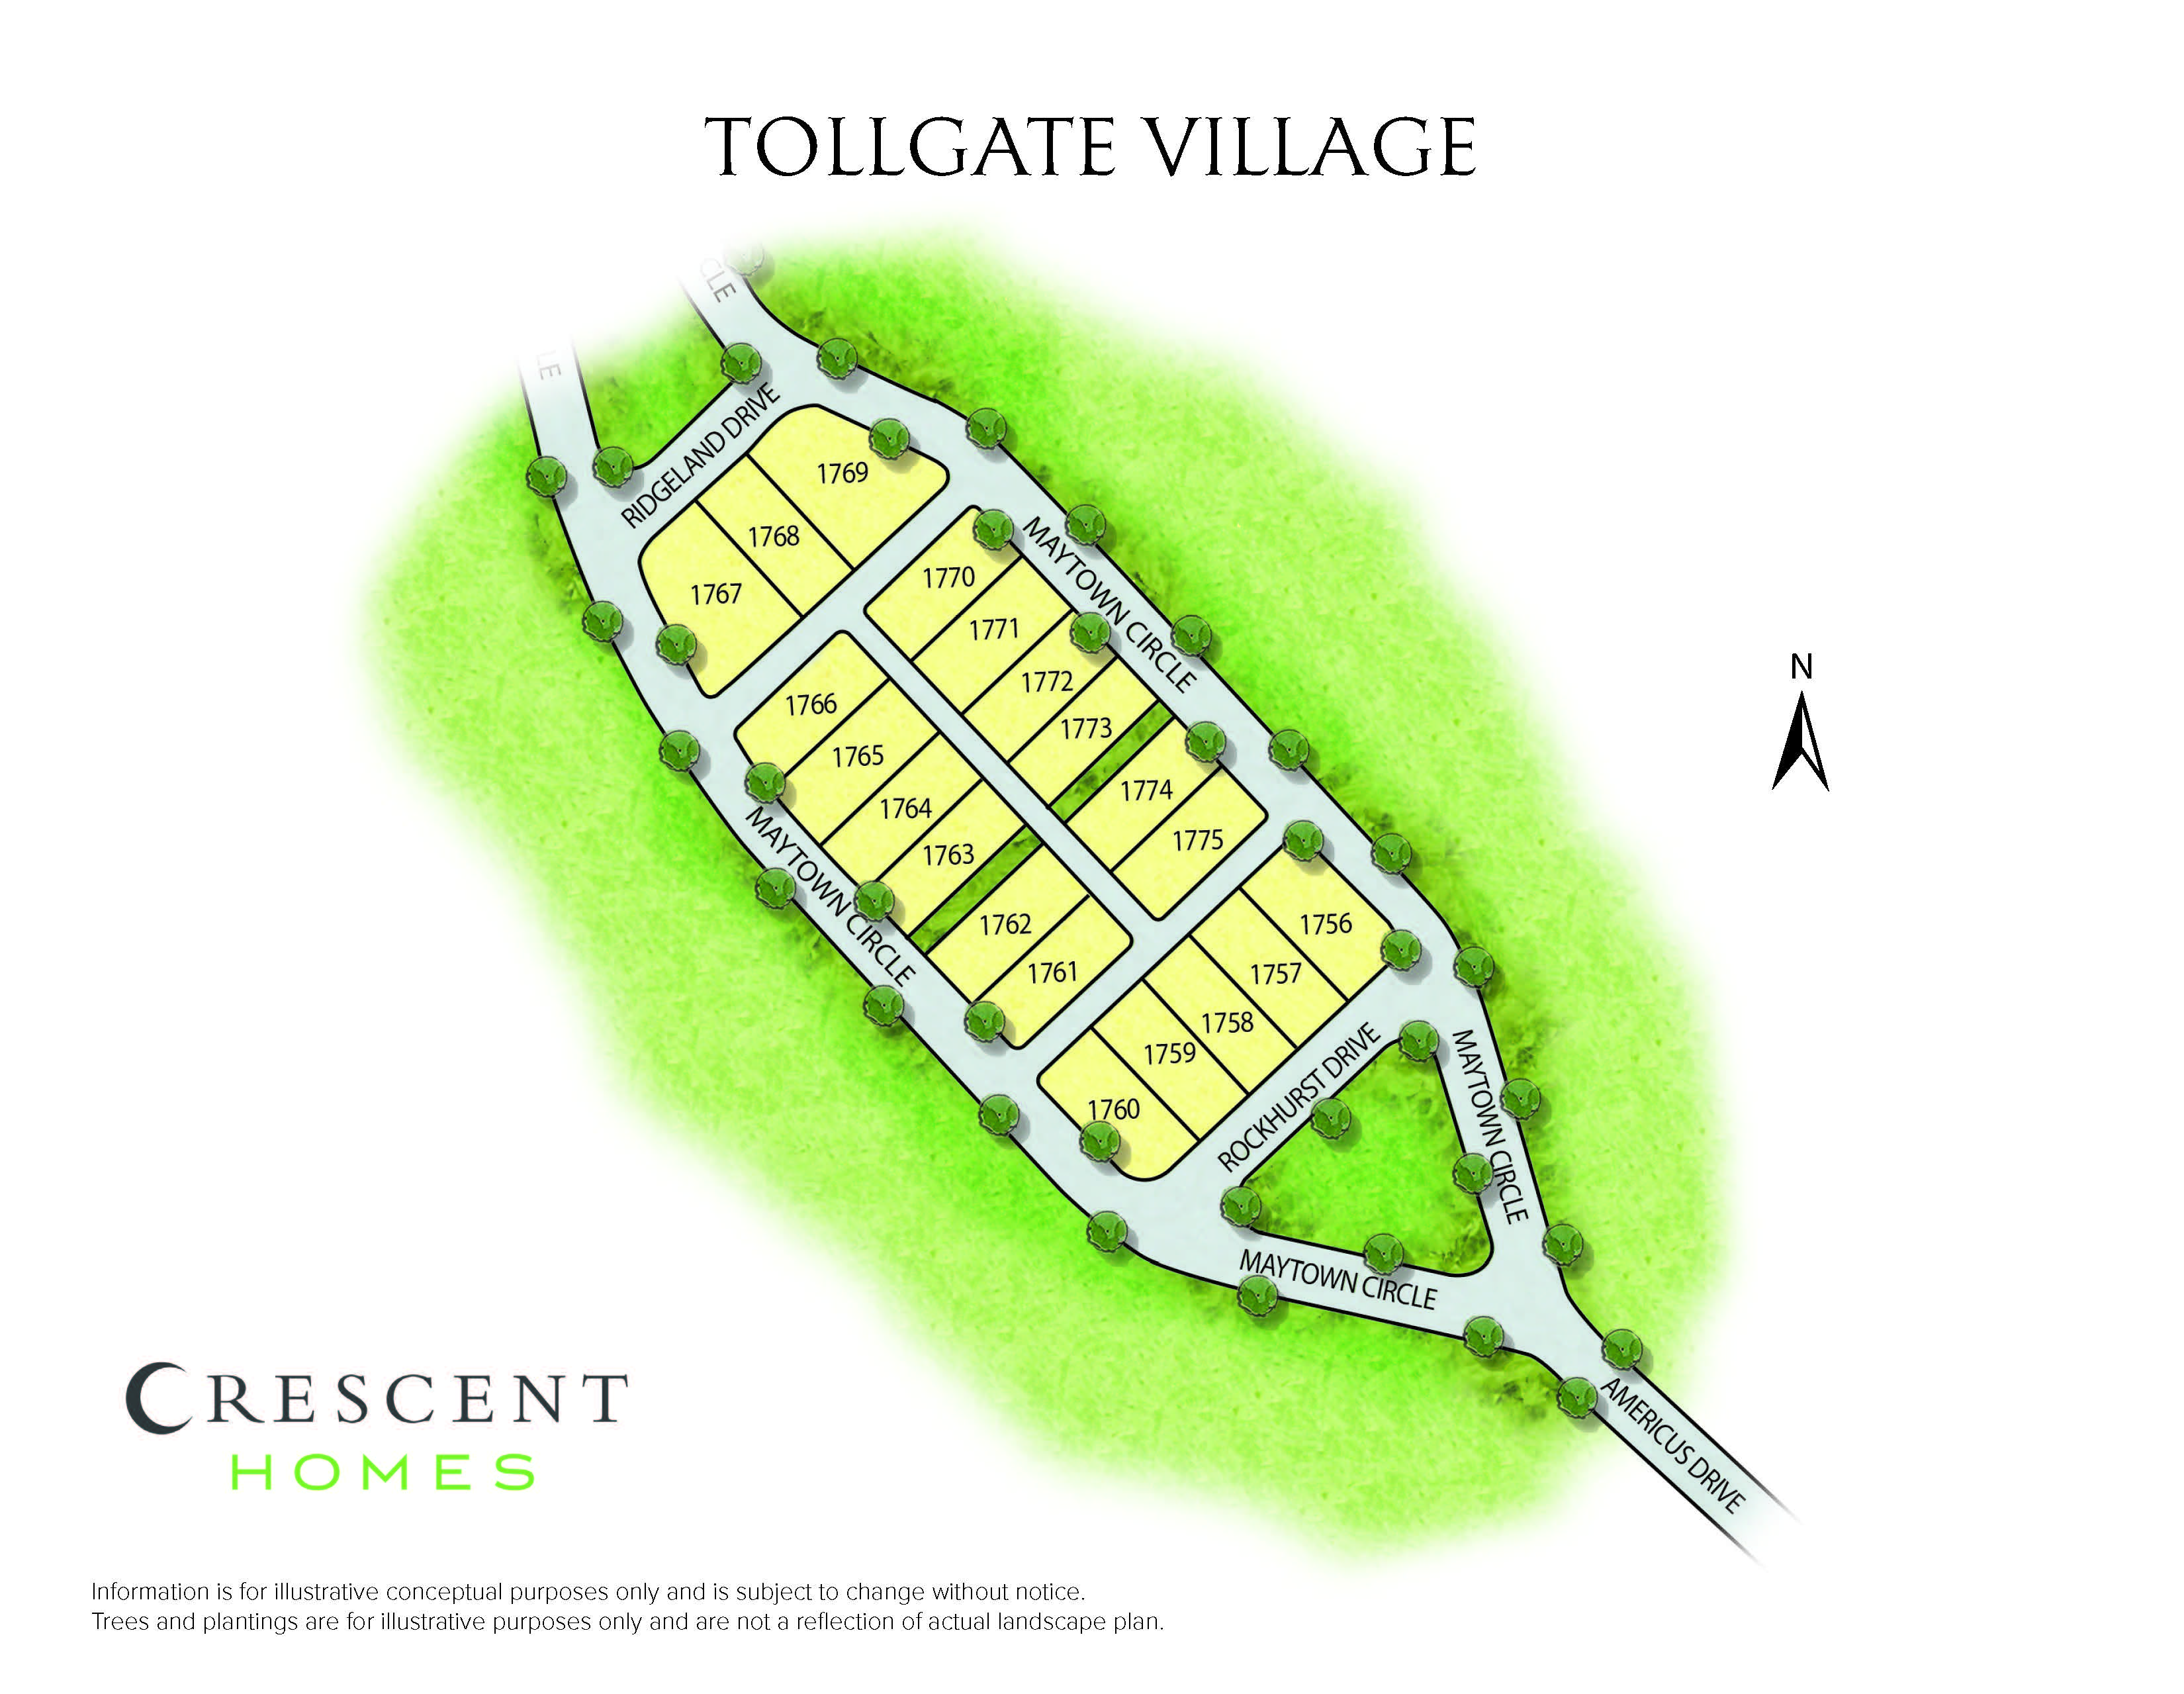 Thompson Station, TN Tollgate Village New Homes